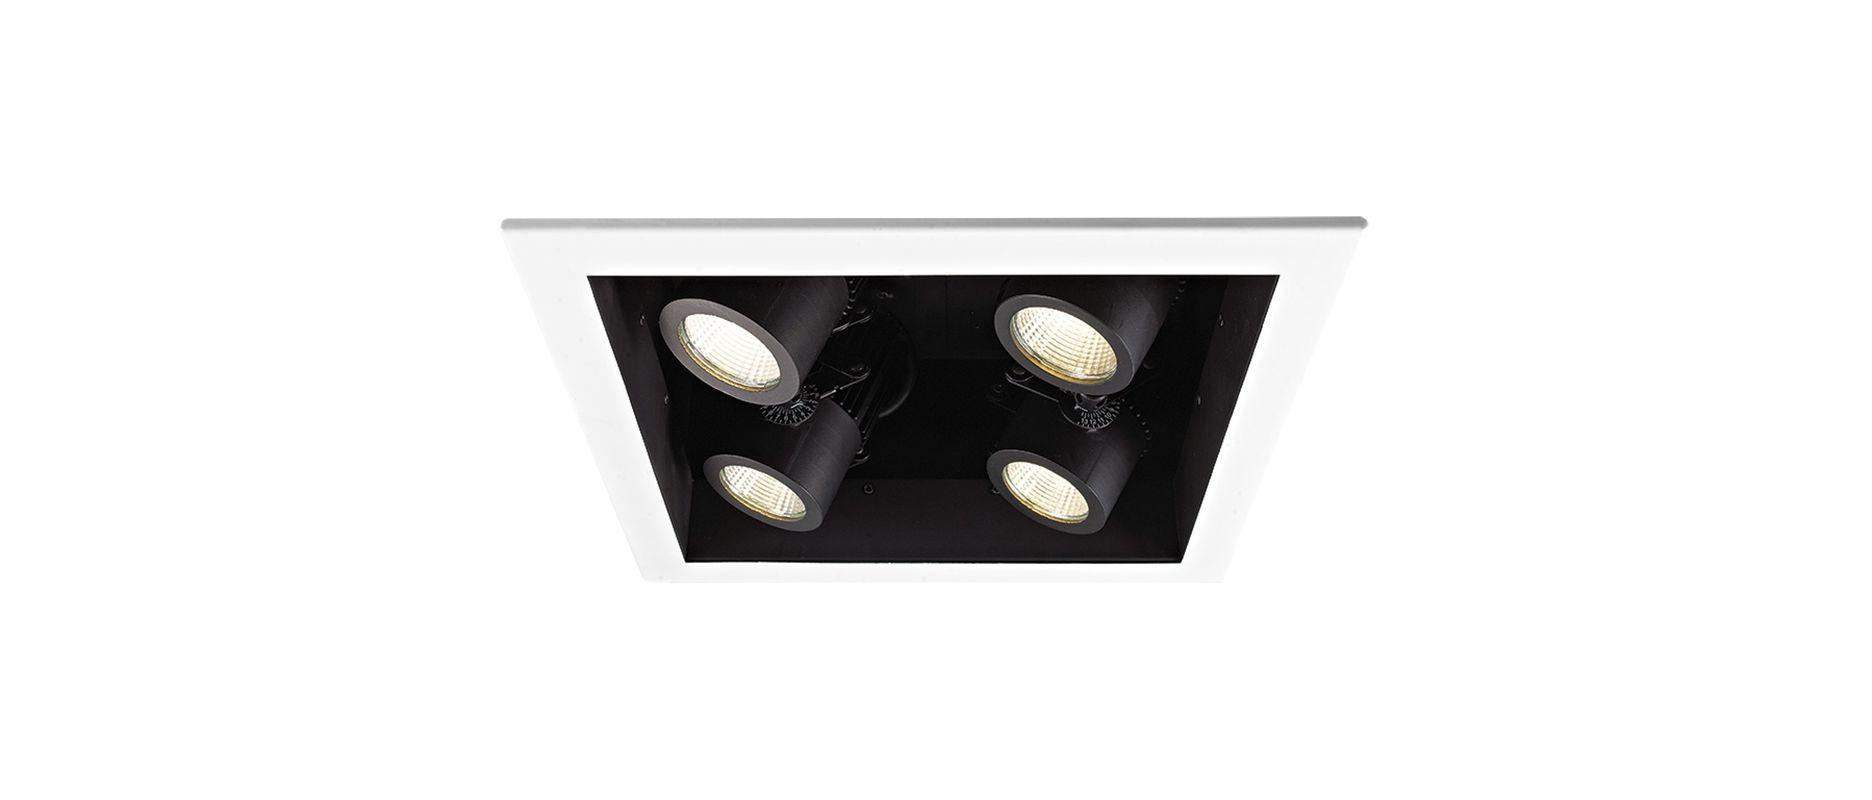 WAC Lighting MT-4LD226N-S27 4 Light Energy Star 2700K High Output LED